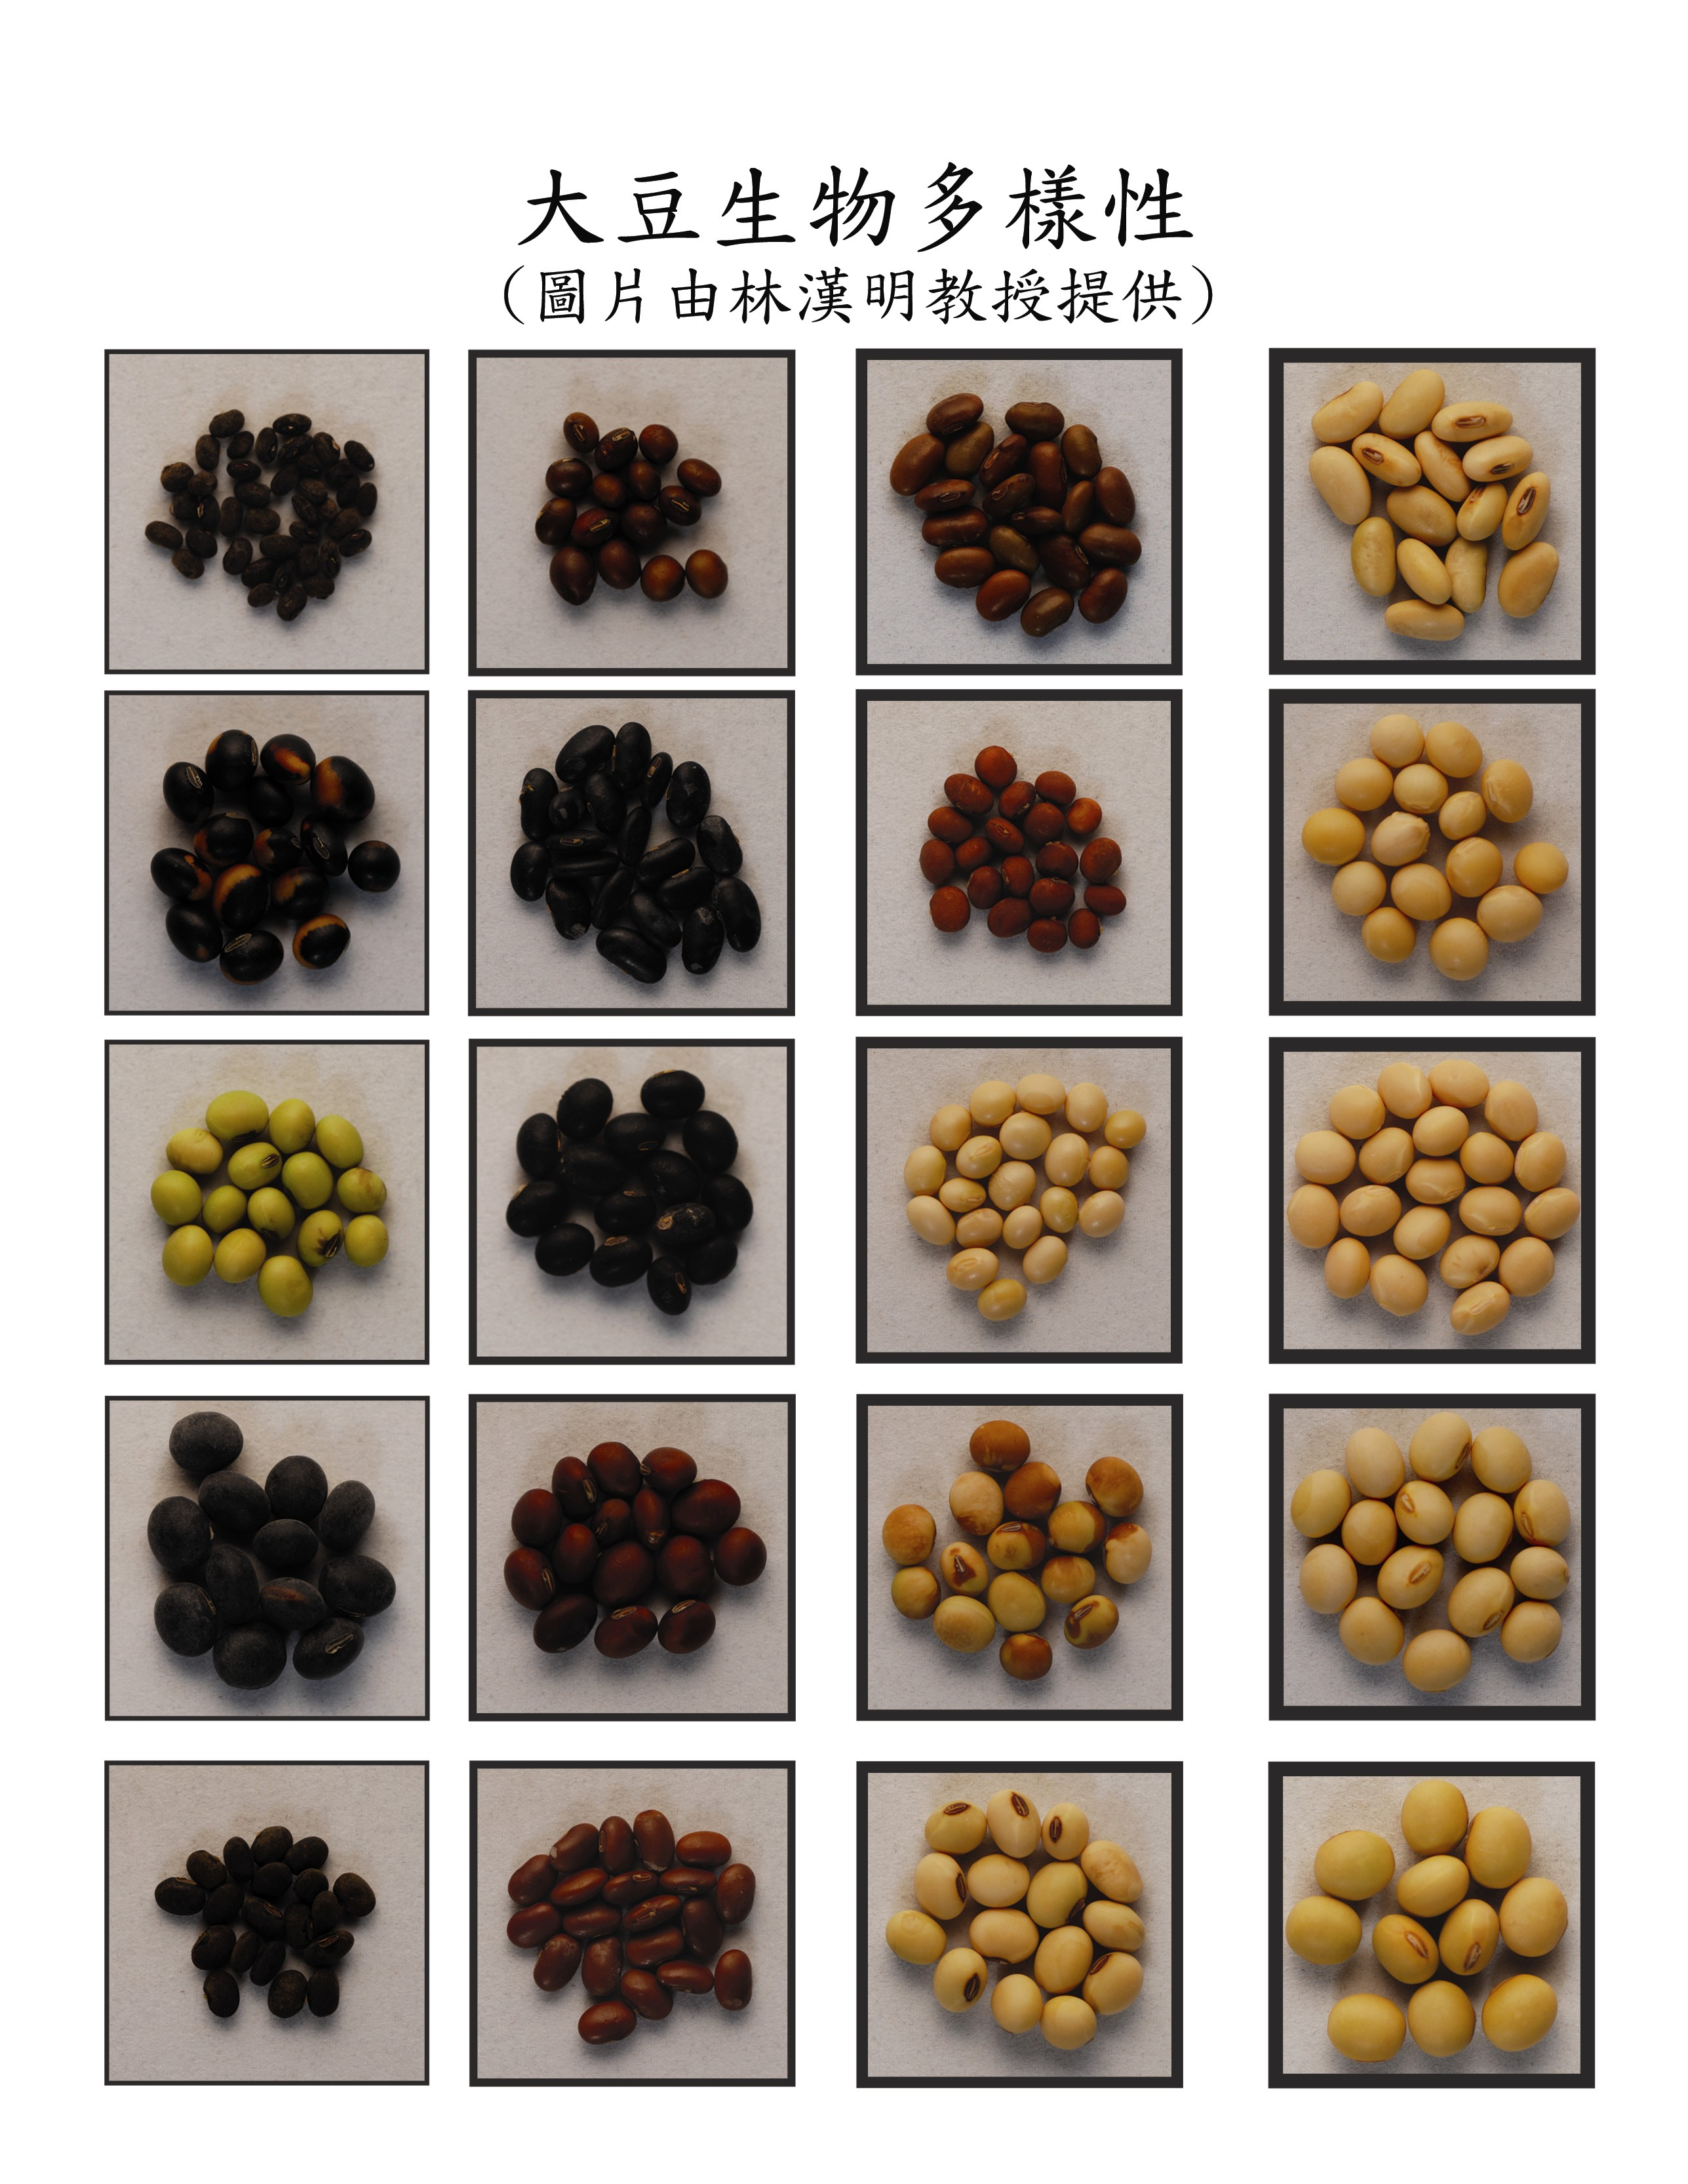 Biodiversity of soybean